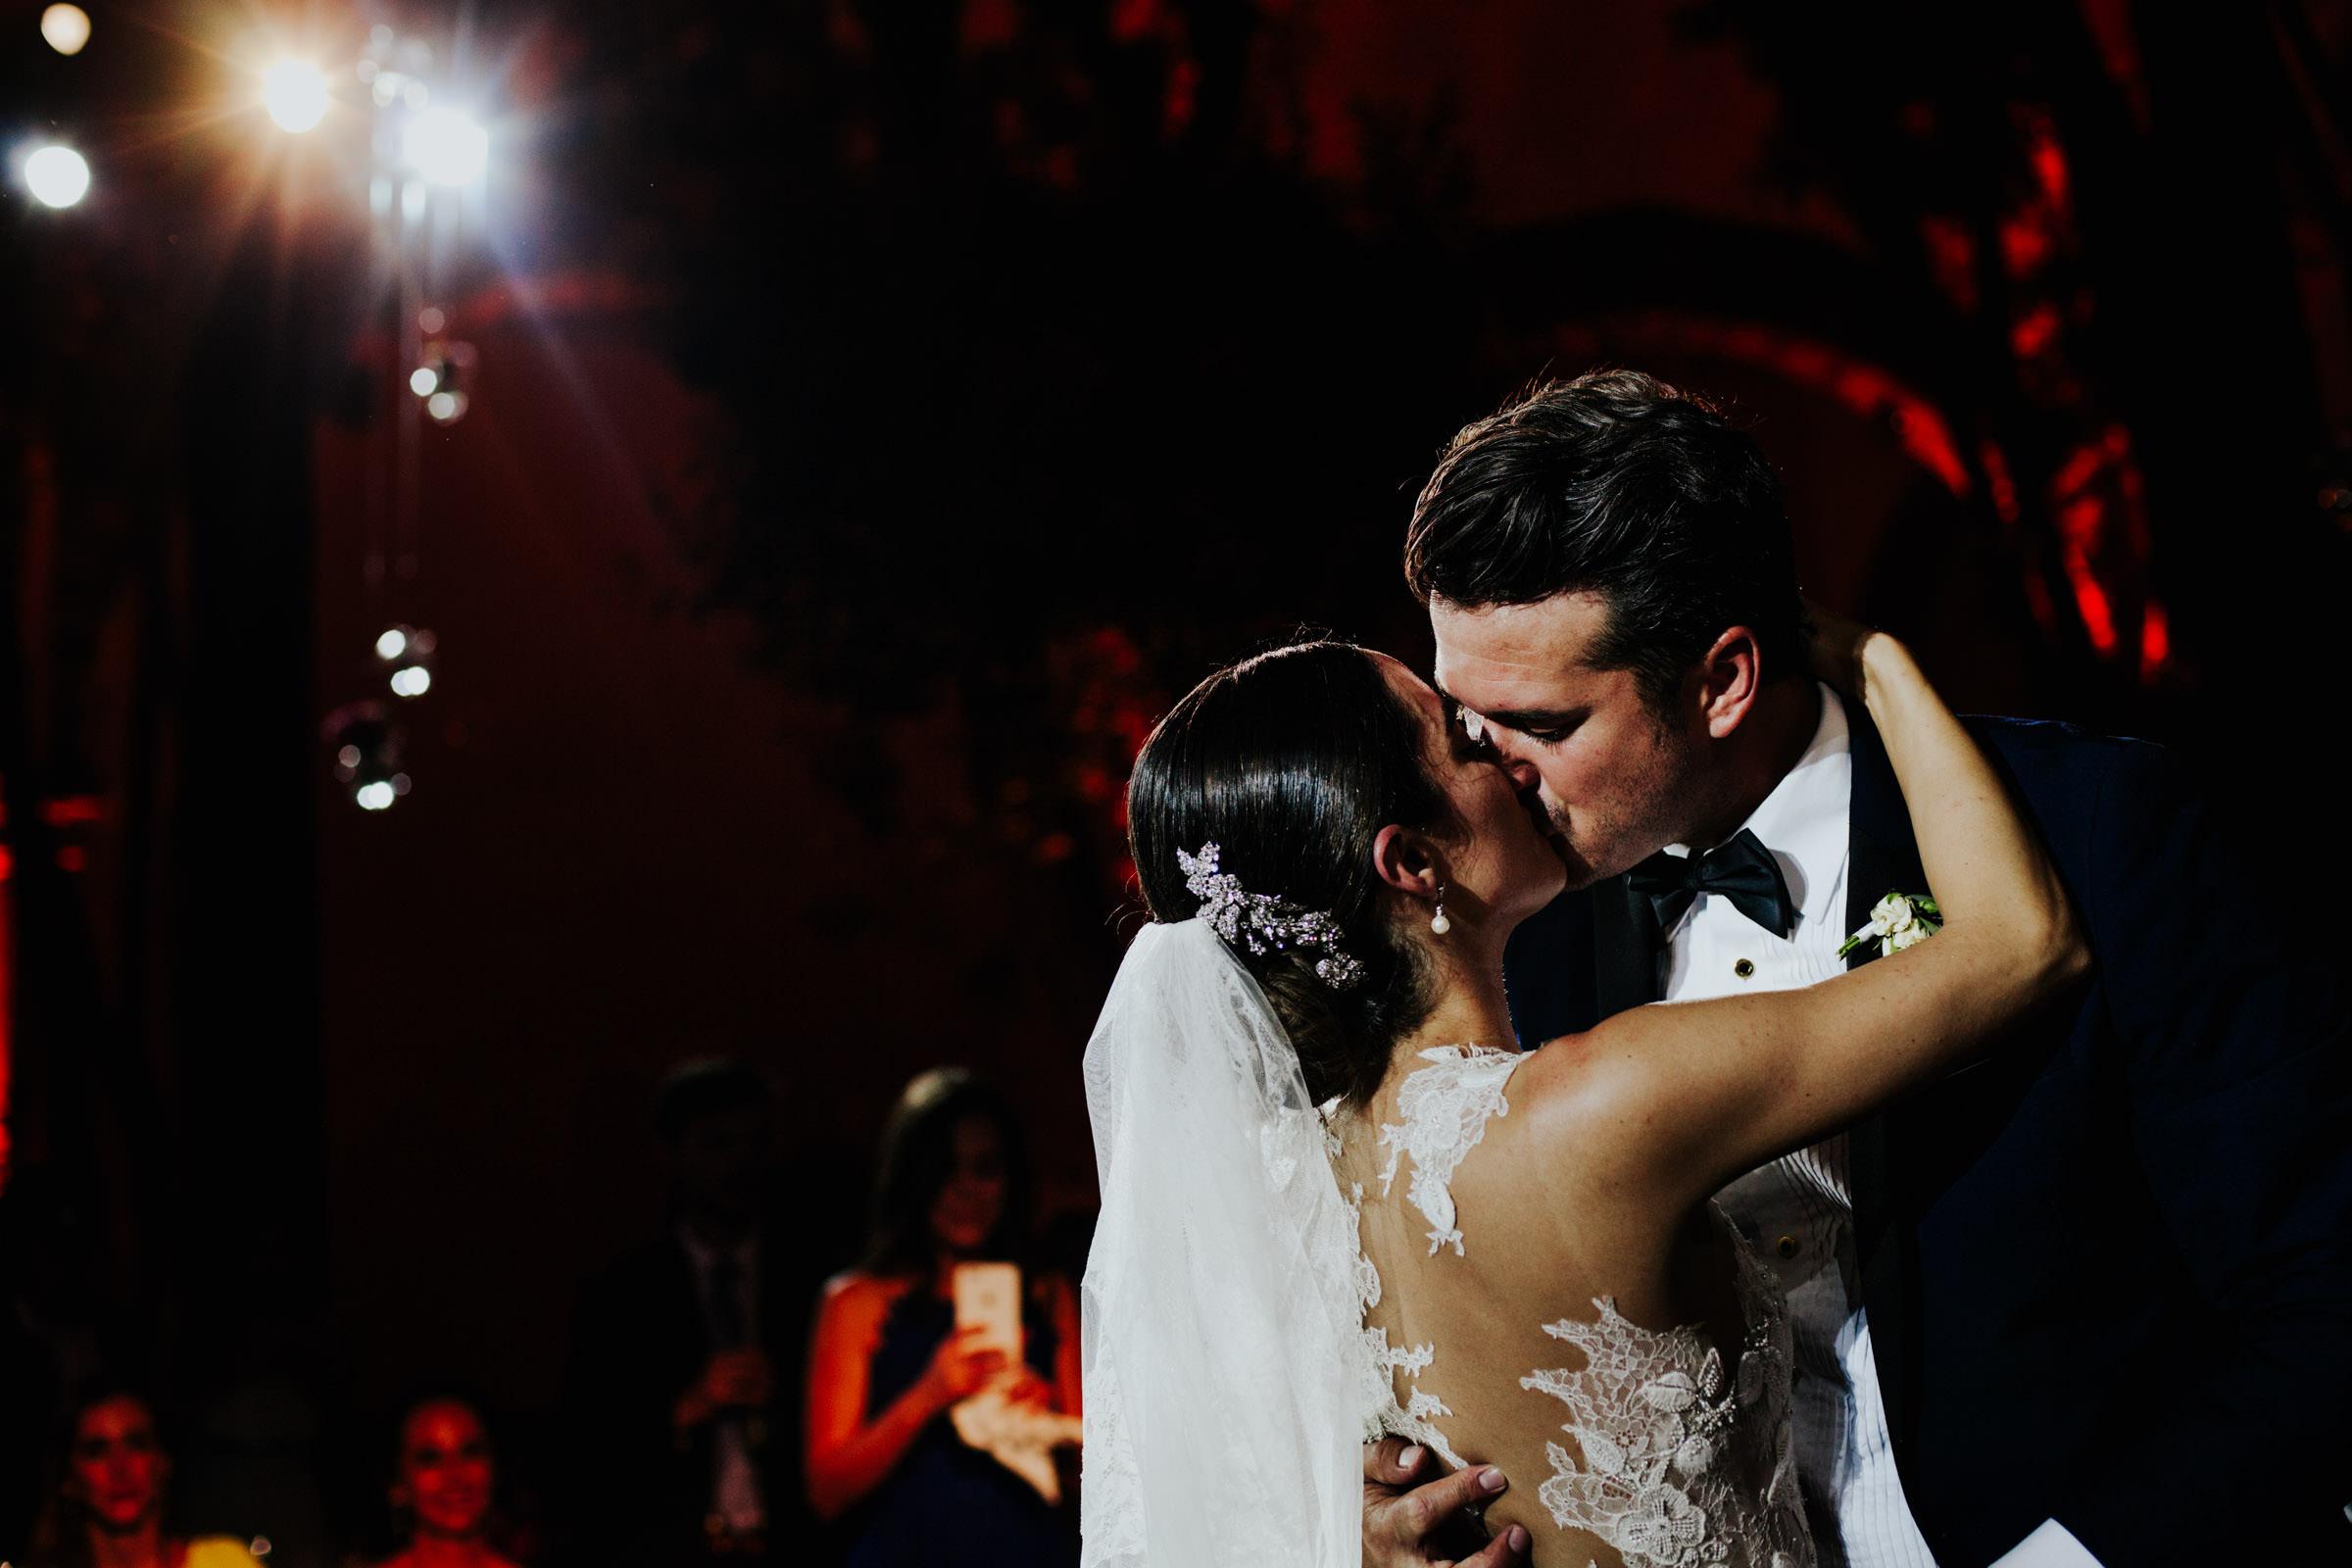 San-Miguel-de-Allende-Wedding-Photography-Parroquia-Instituto-Boda-Fotografia-Fer-Sergio-Pierce-Lifestyle-Photography0038.JPG